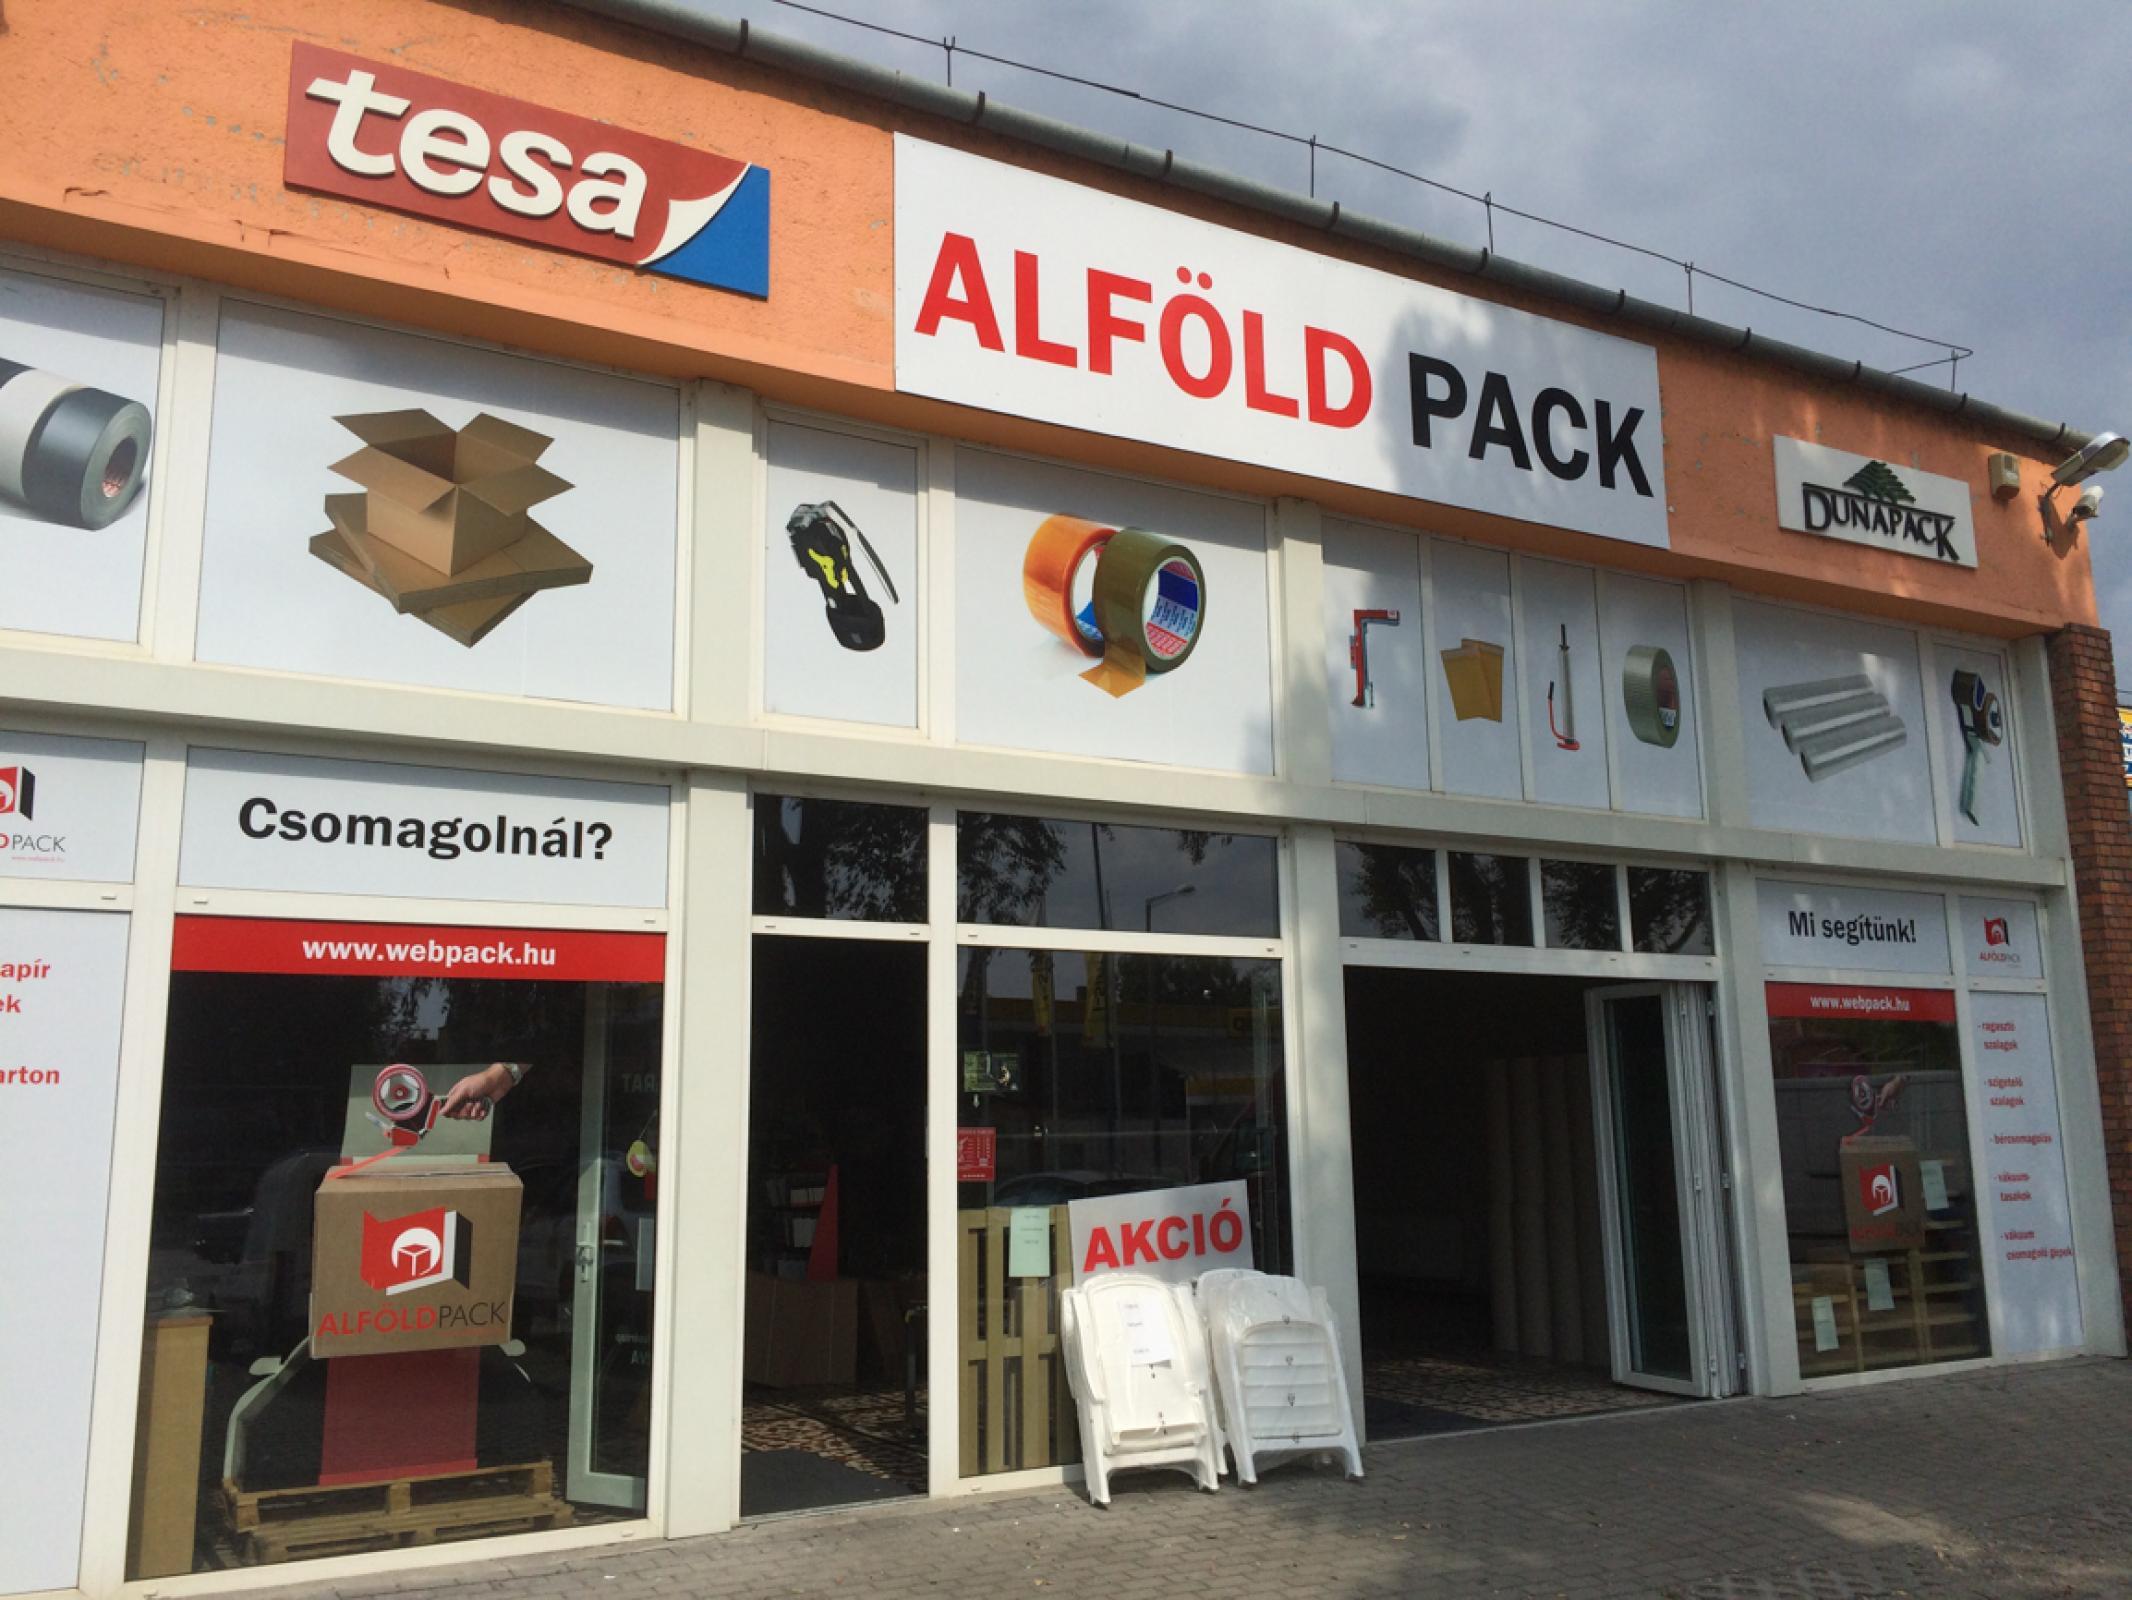 Alföld Pack